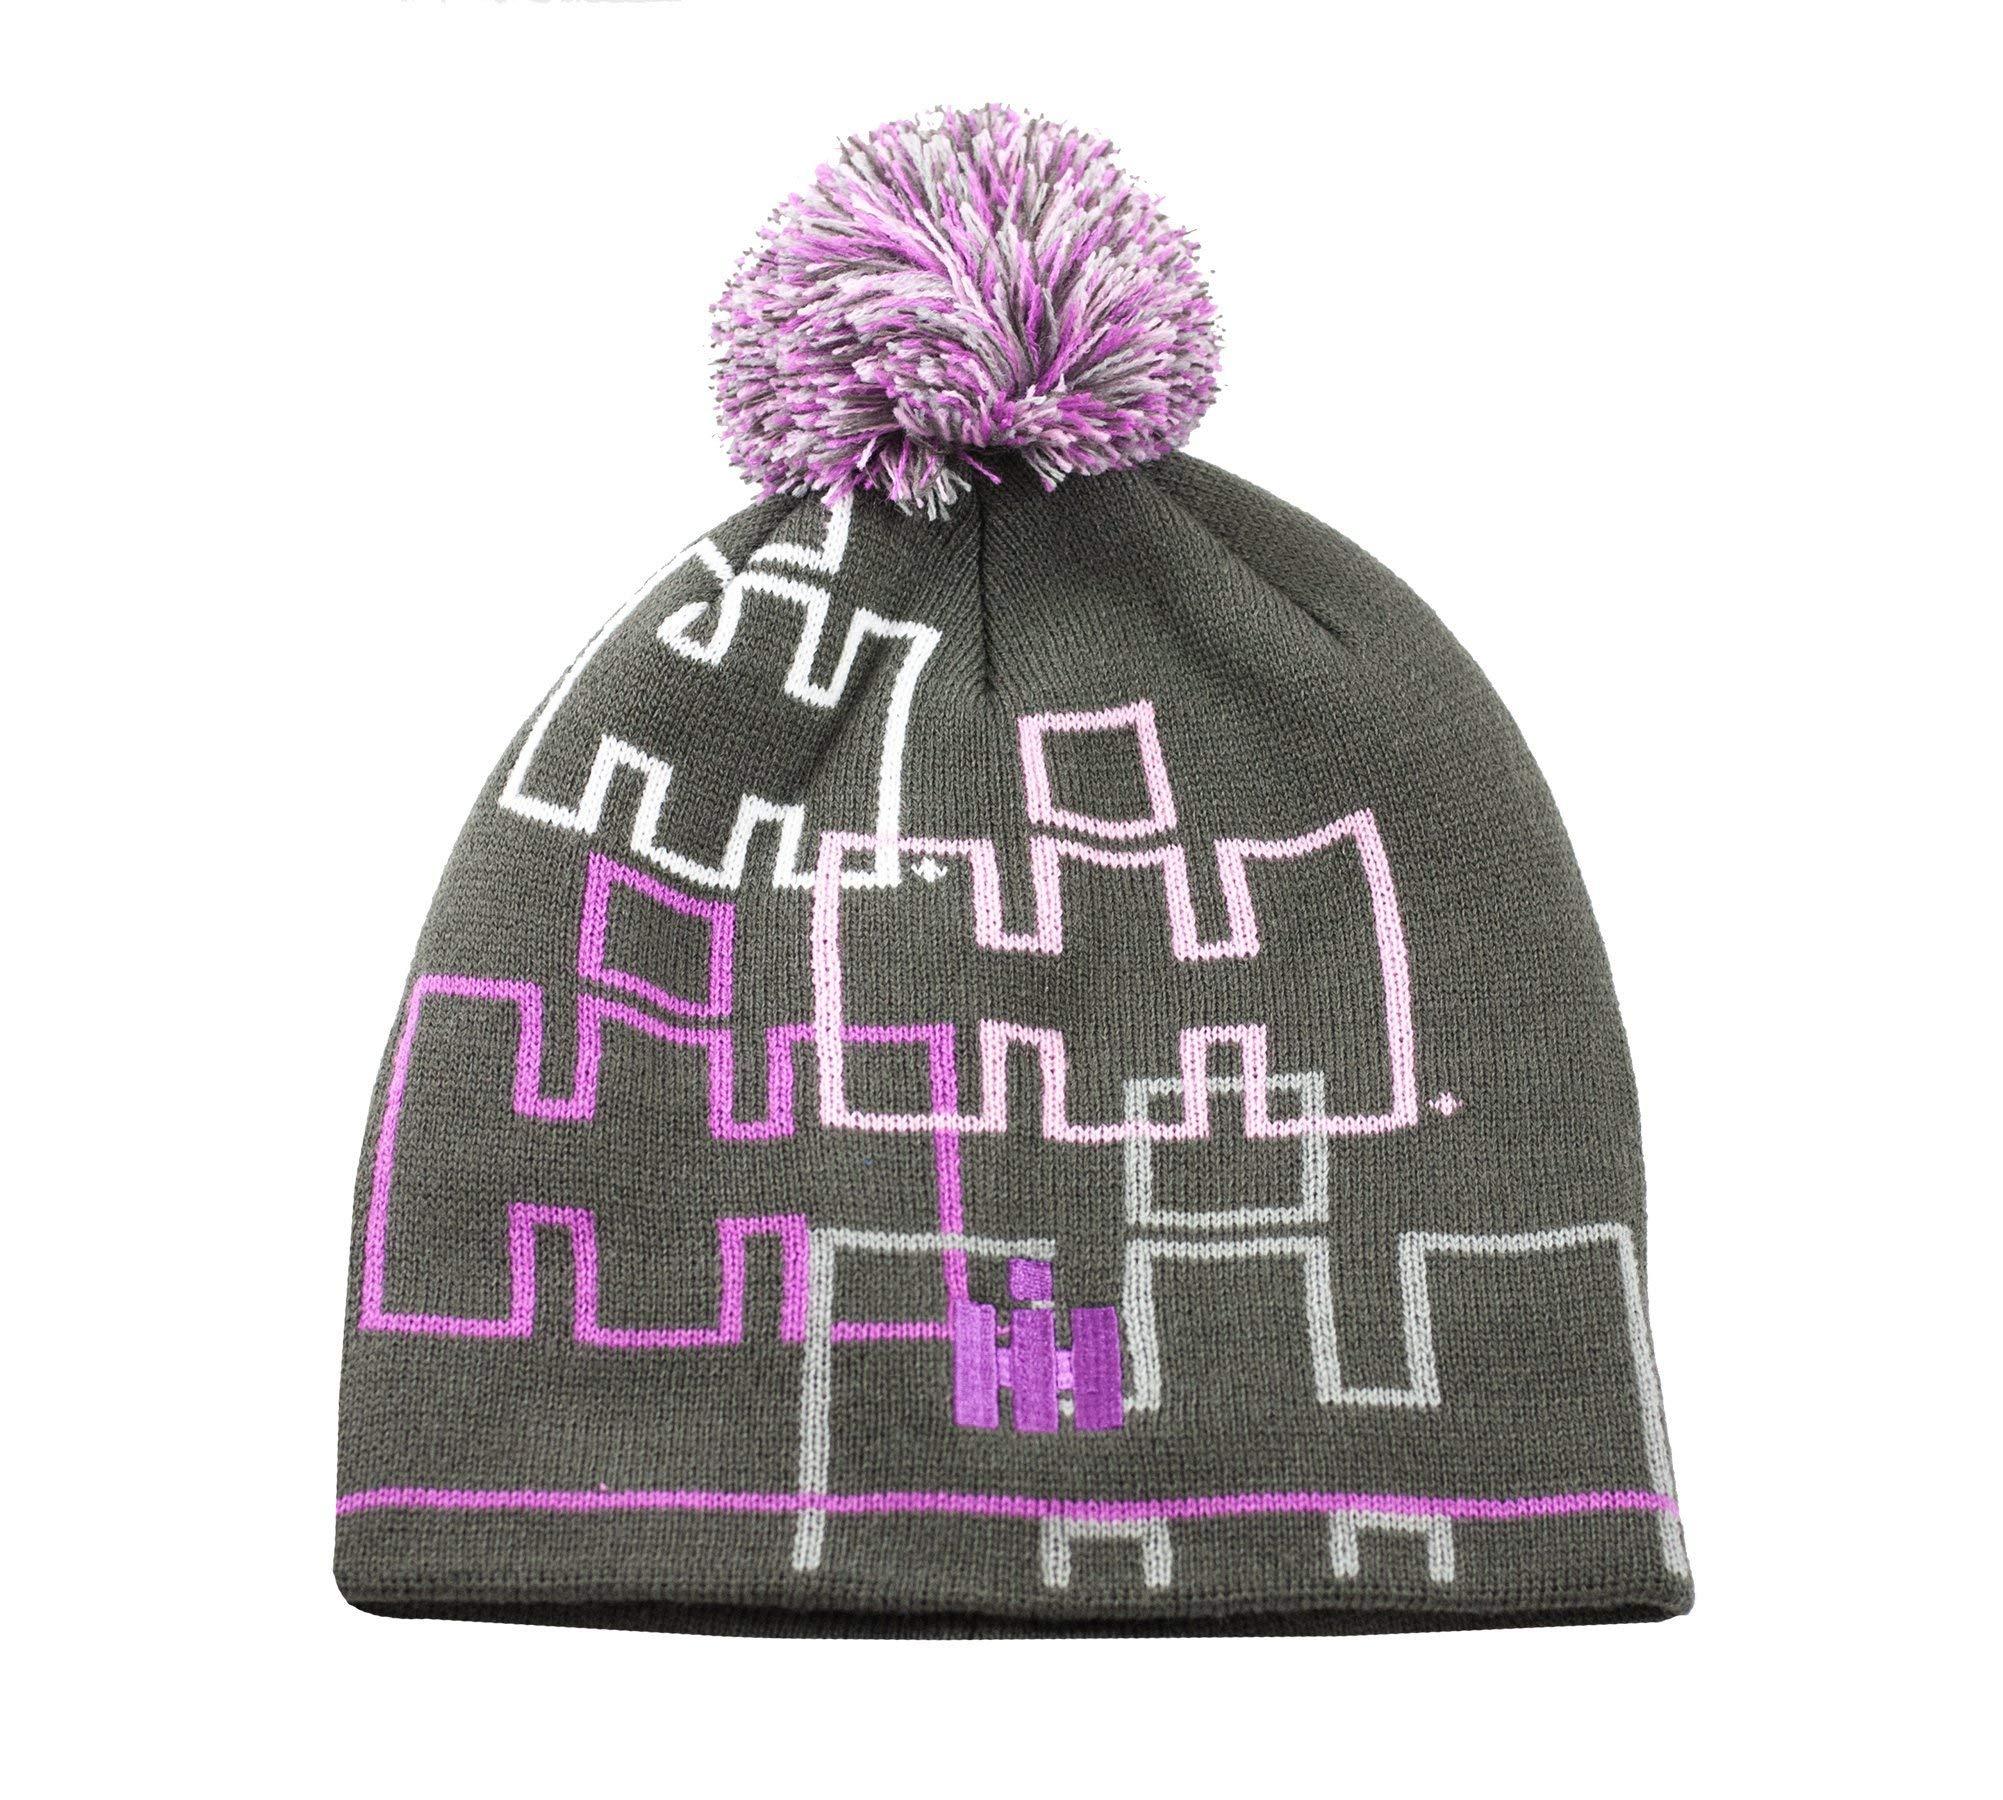 International Harvester IH Youth Jacquard Gray & Pink Pom Pom Knit Hat - Officially Licensed